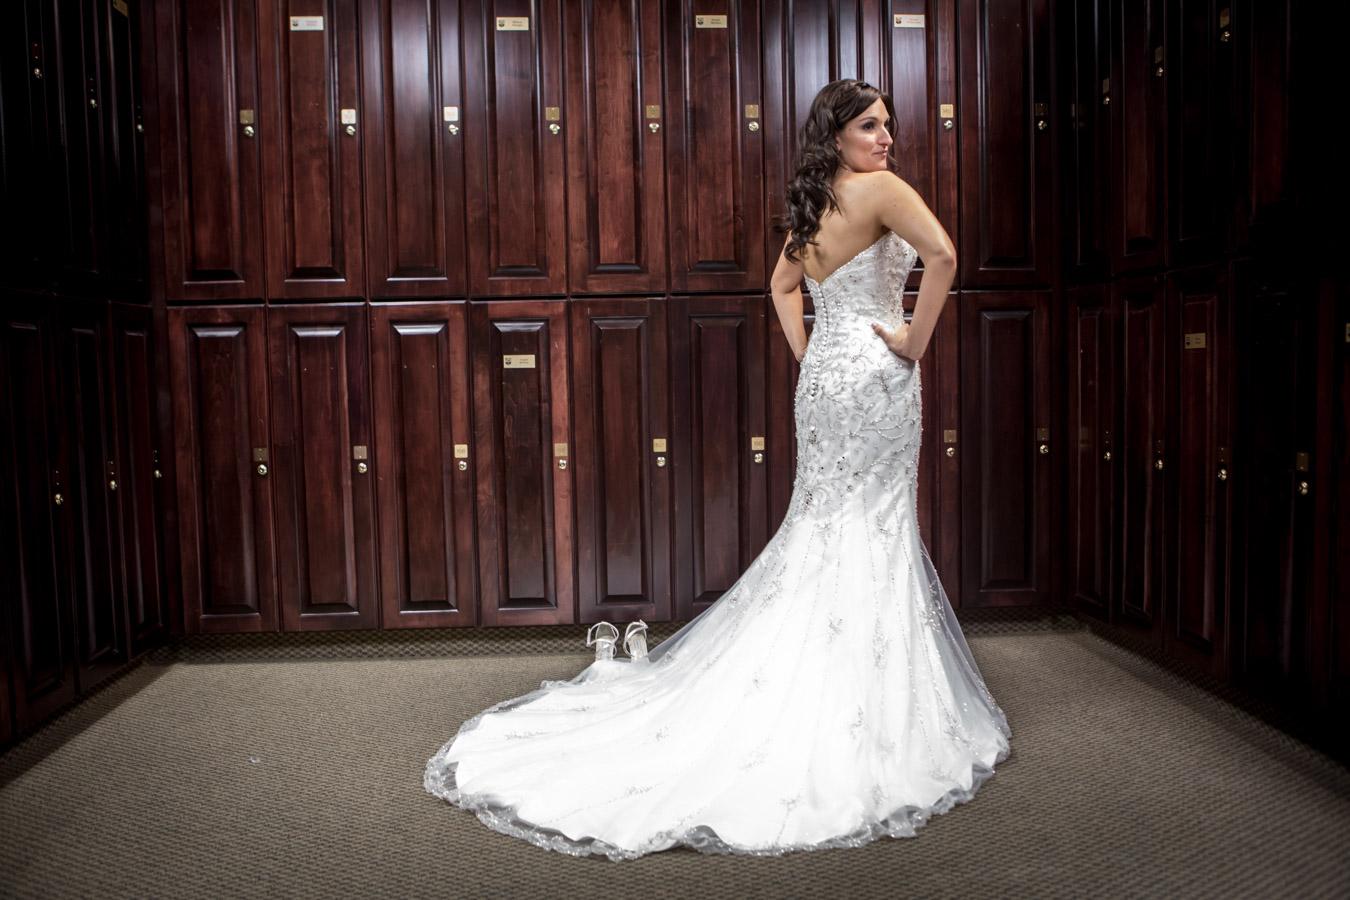 NEPA_Pocono_Weddings_Rob_Lettieri_Photography_01.jpg